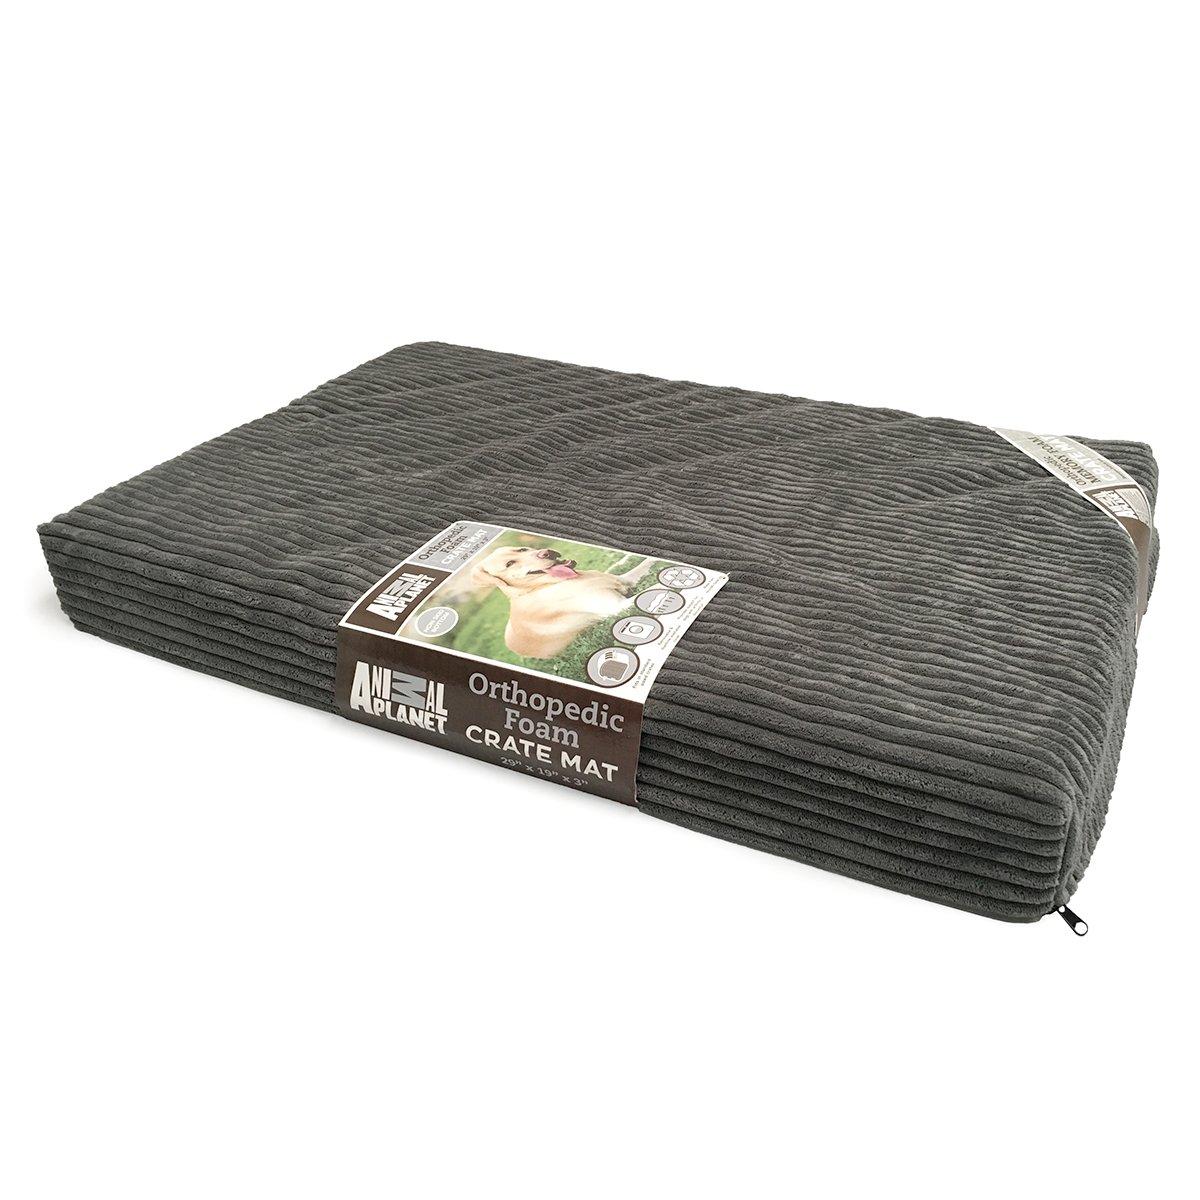 Animal Planet Orthopedic Pet Bed, 40''x26''x3'', Grey by Animal Planet (Image #1)